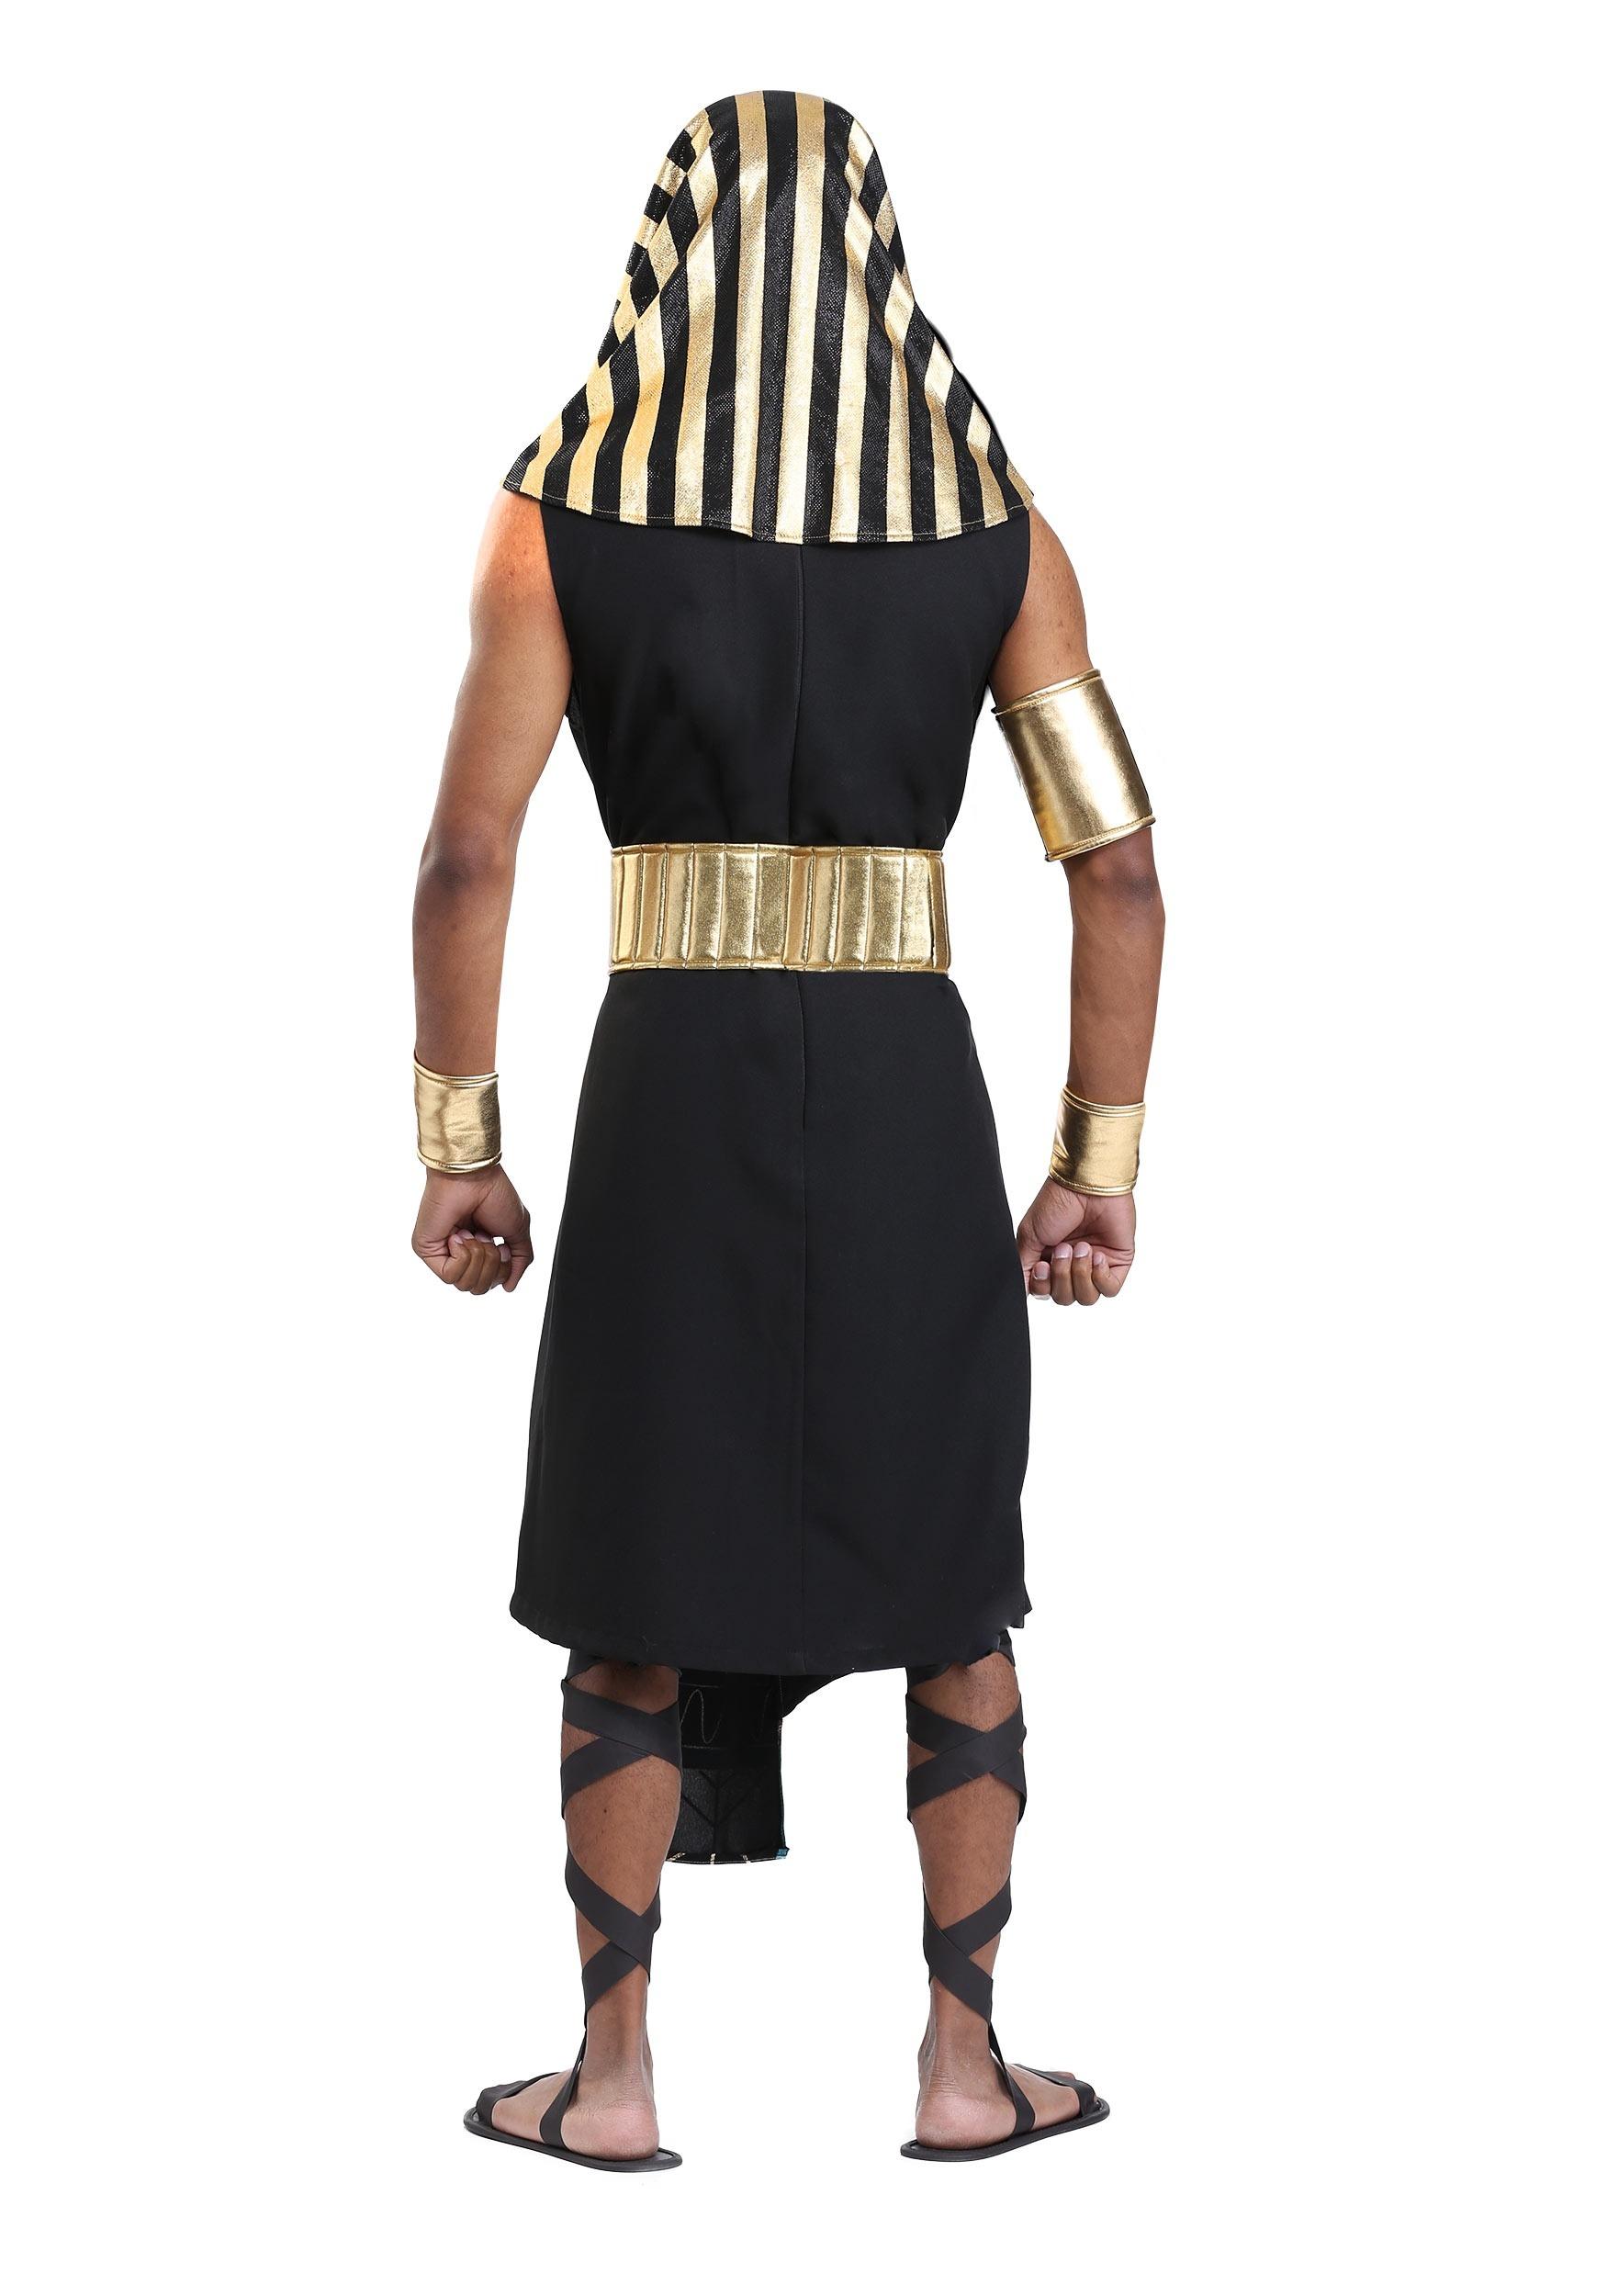 Menu0027s Dark Egyptian Pharaoh Costume Menu0027s Dark Egyptian Pharaoh Costume2  sc 1 st  Halloween Costumes CA & Dark Egyptian Pharaoh Costume for Men